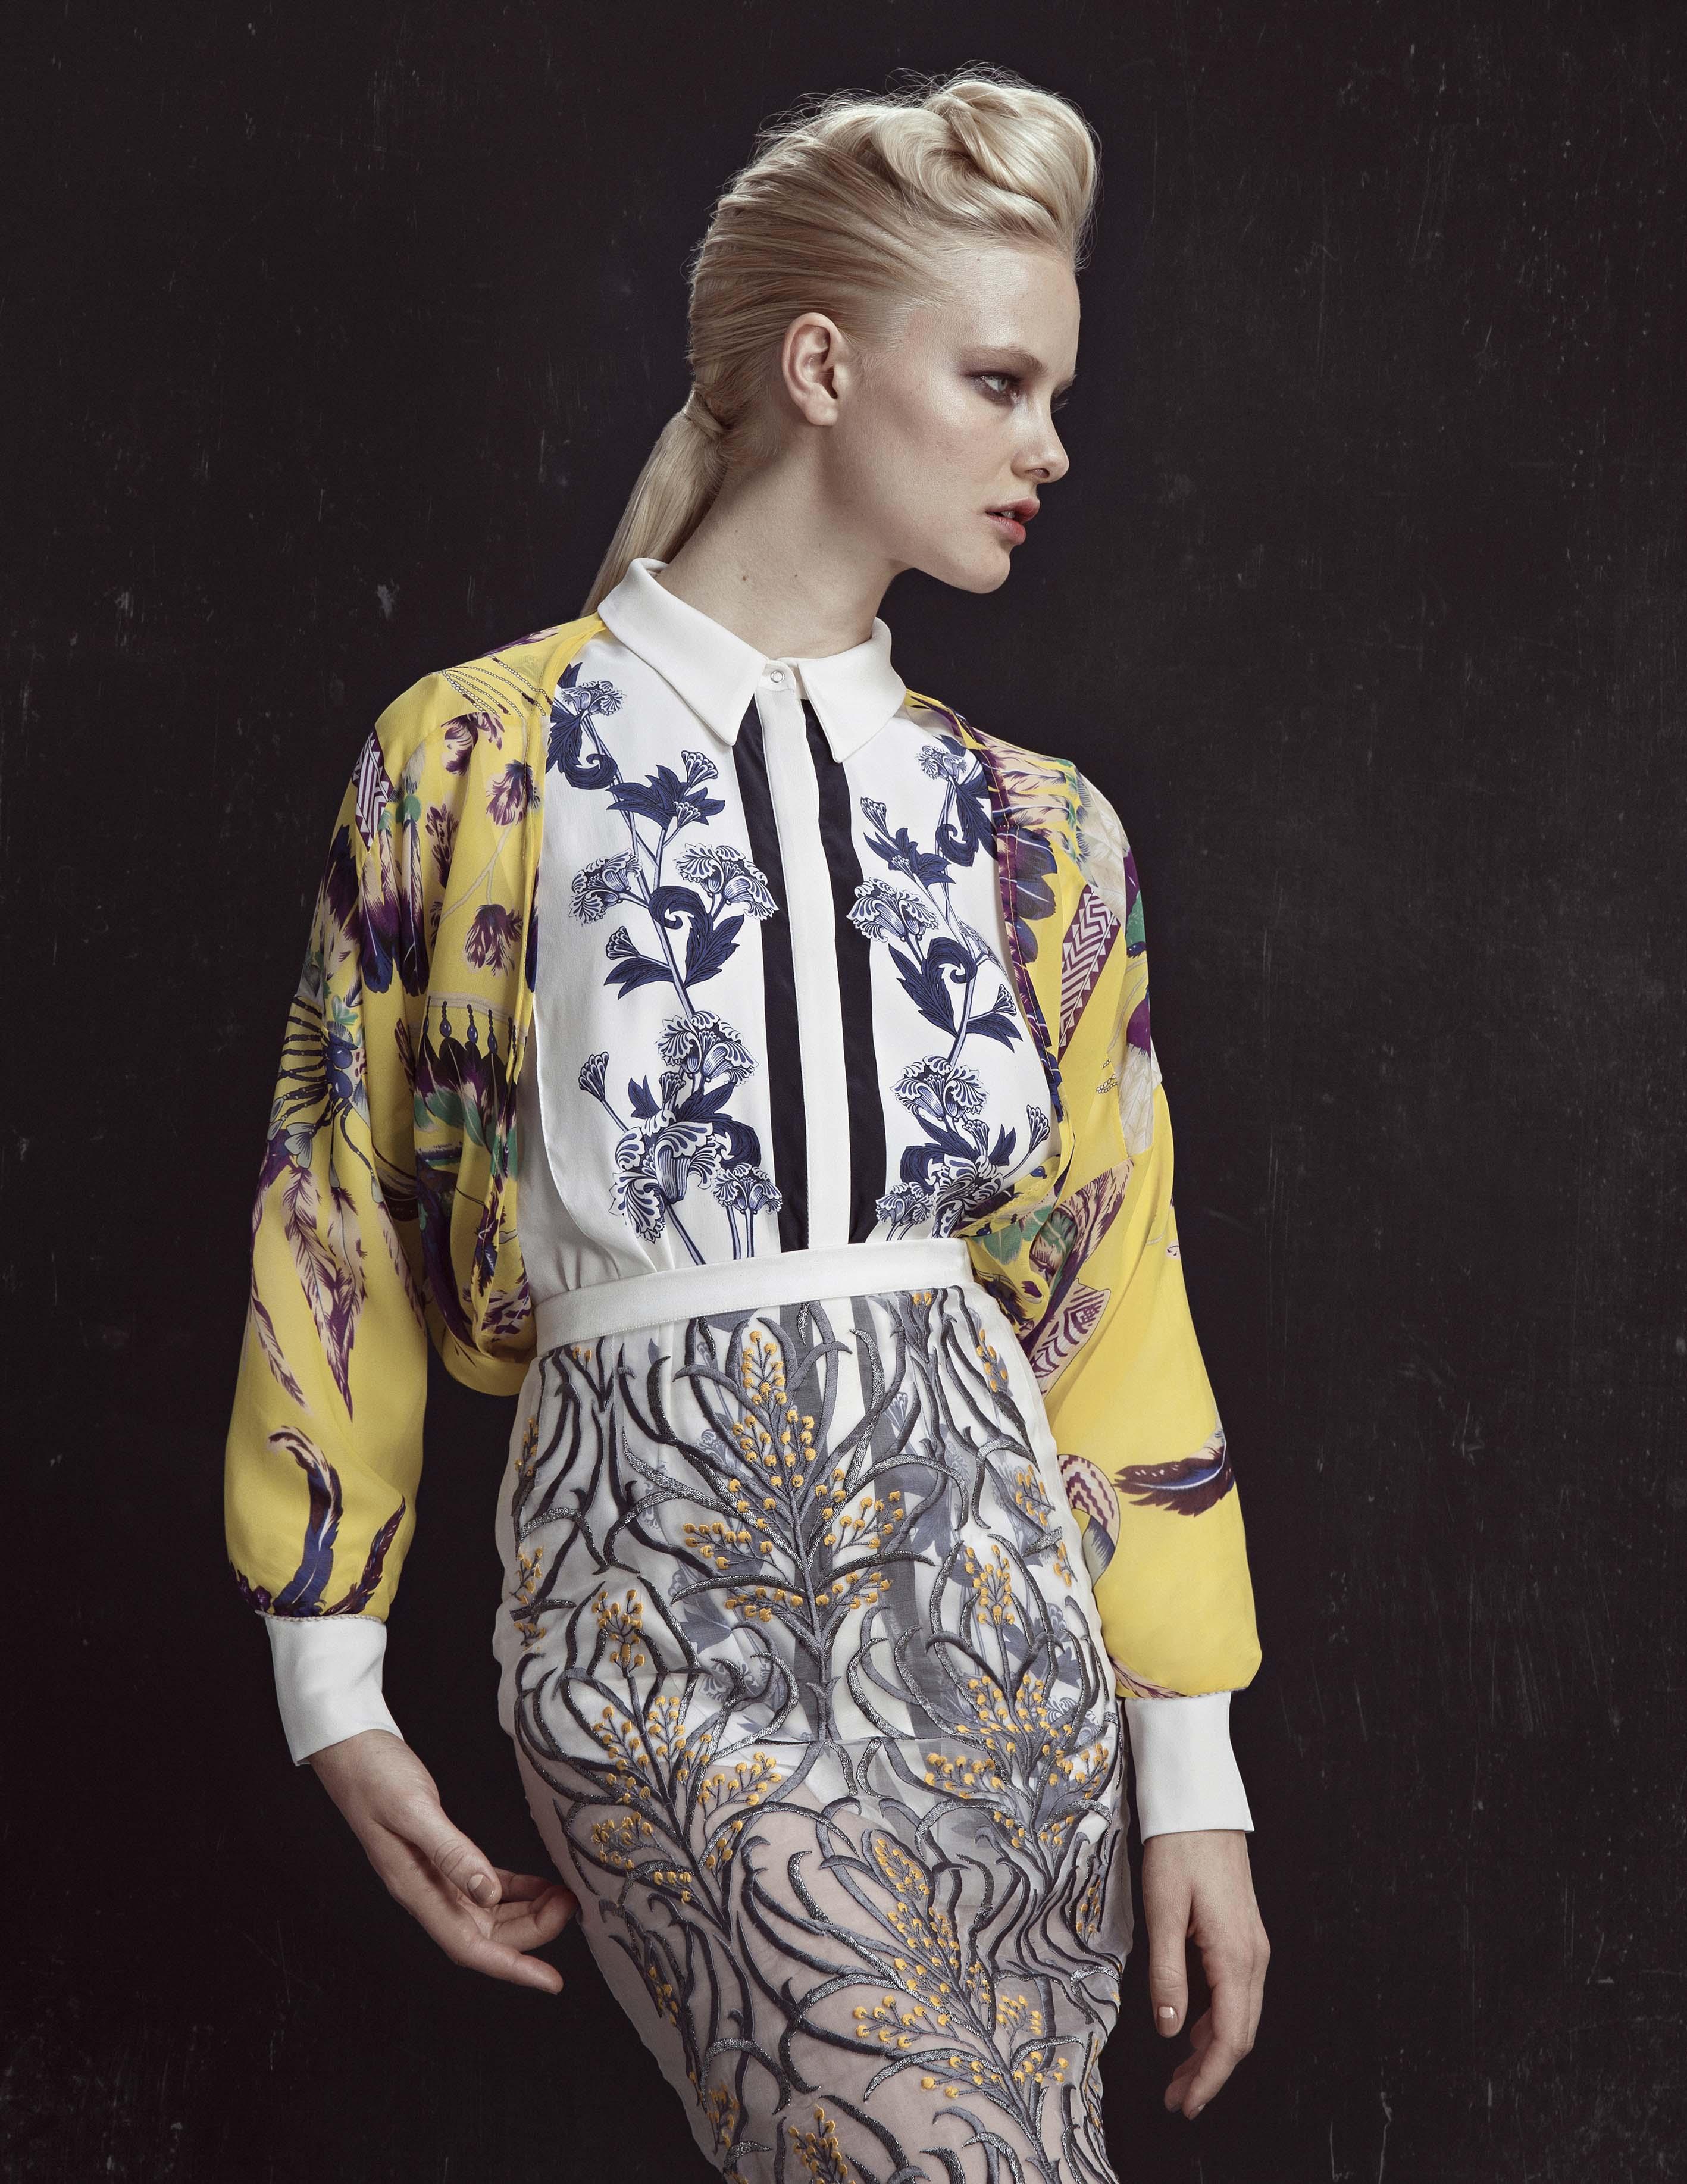 Anna foster fashion stylist Sporty - TheChiliCool Fashion Blog Italia